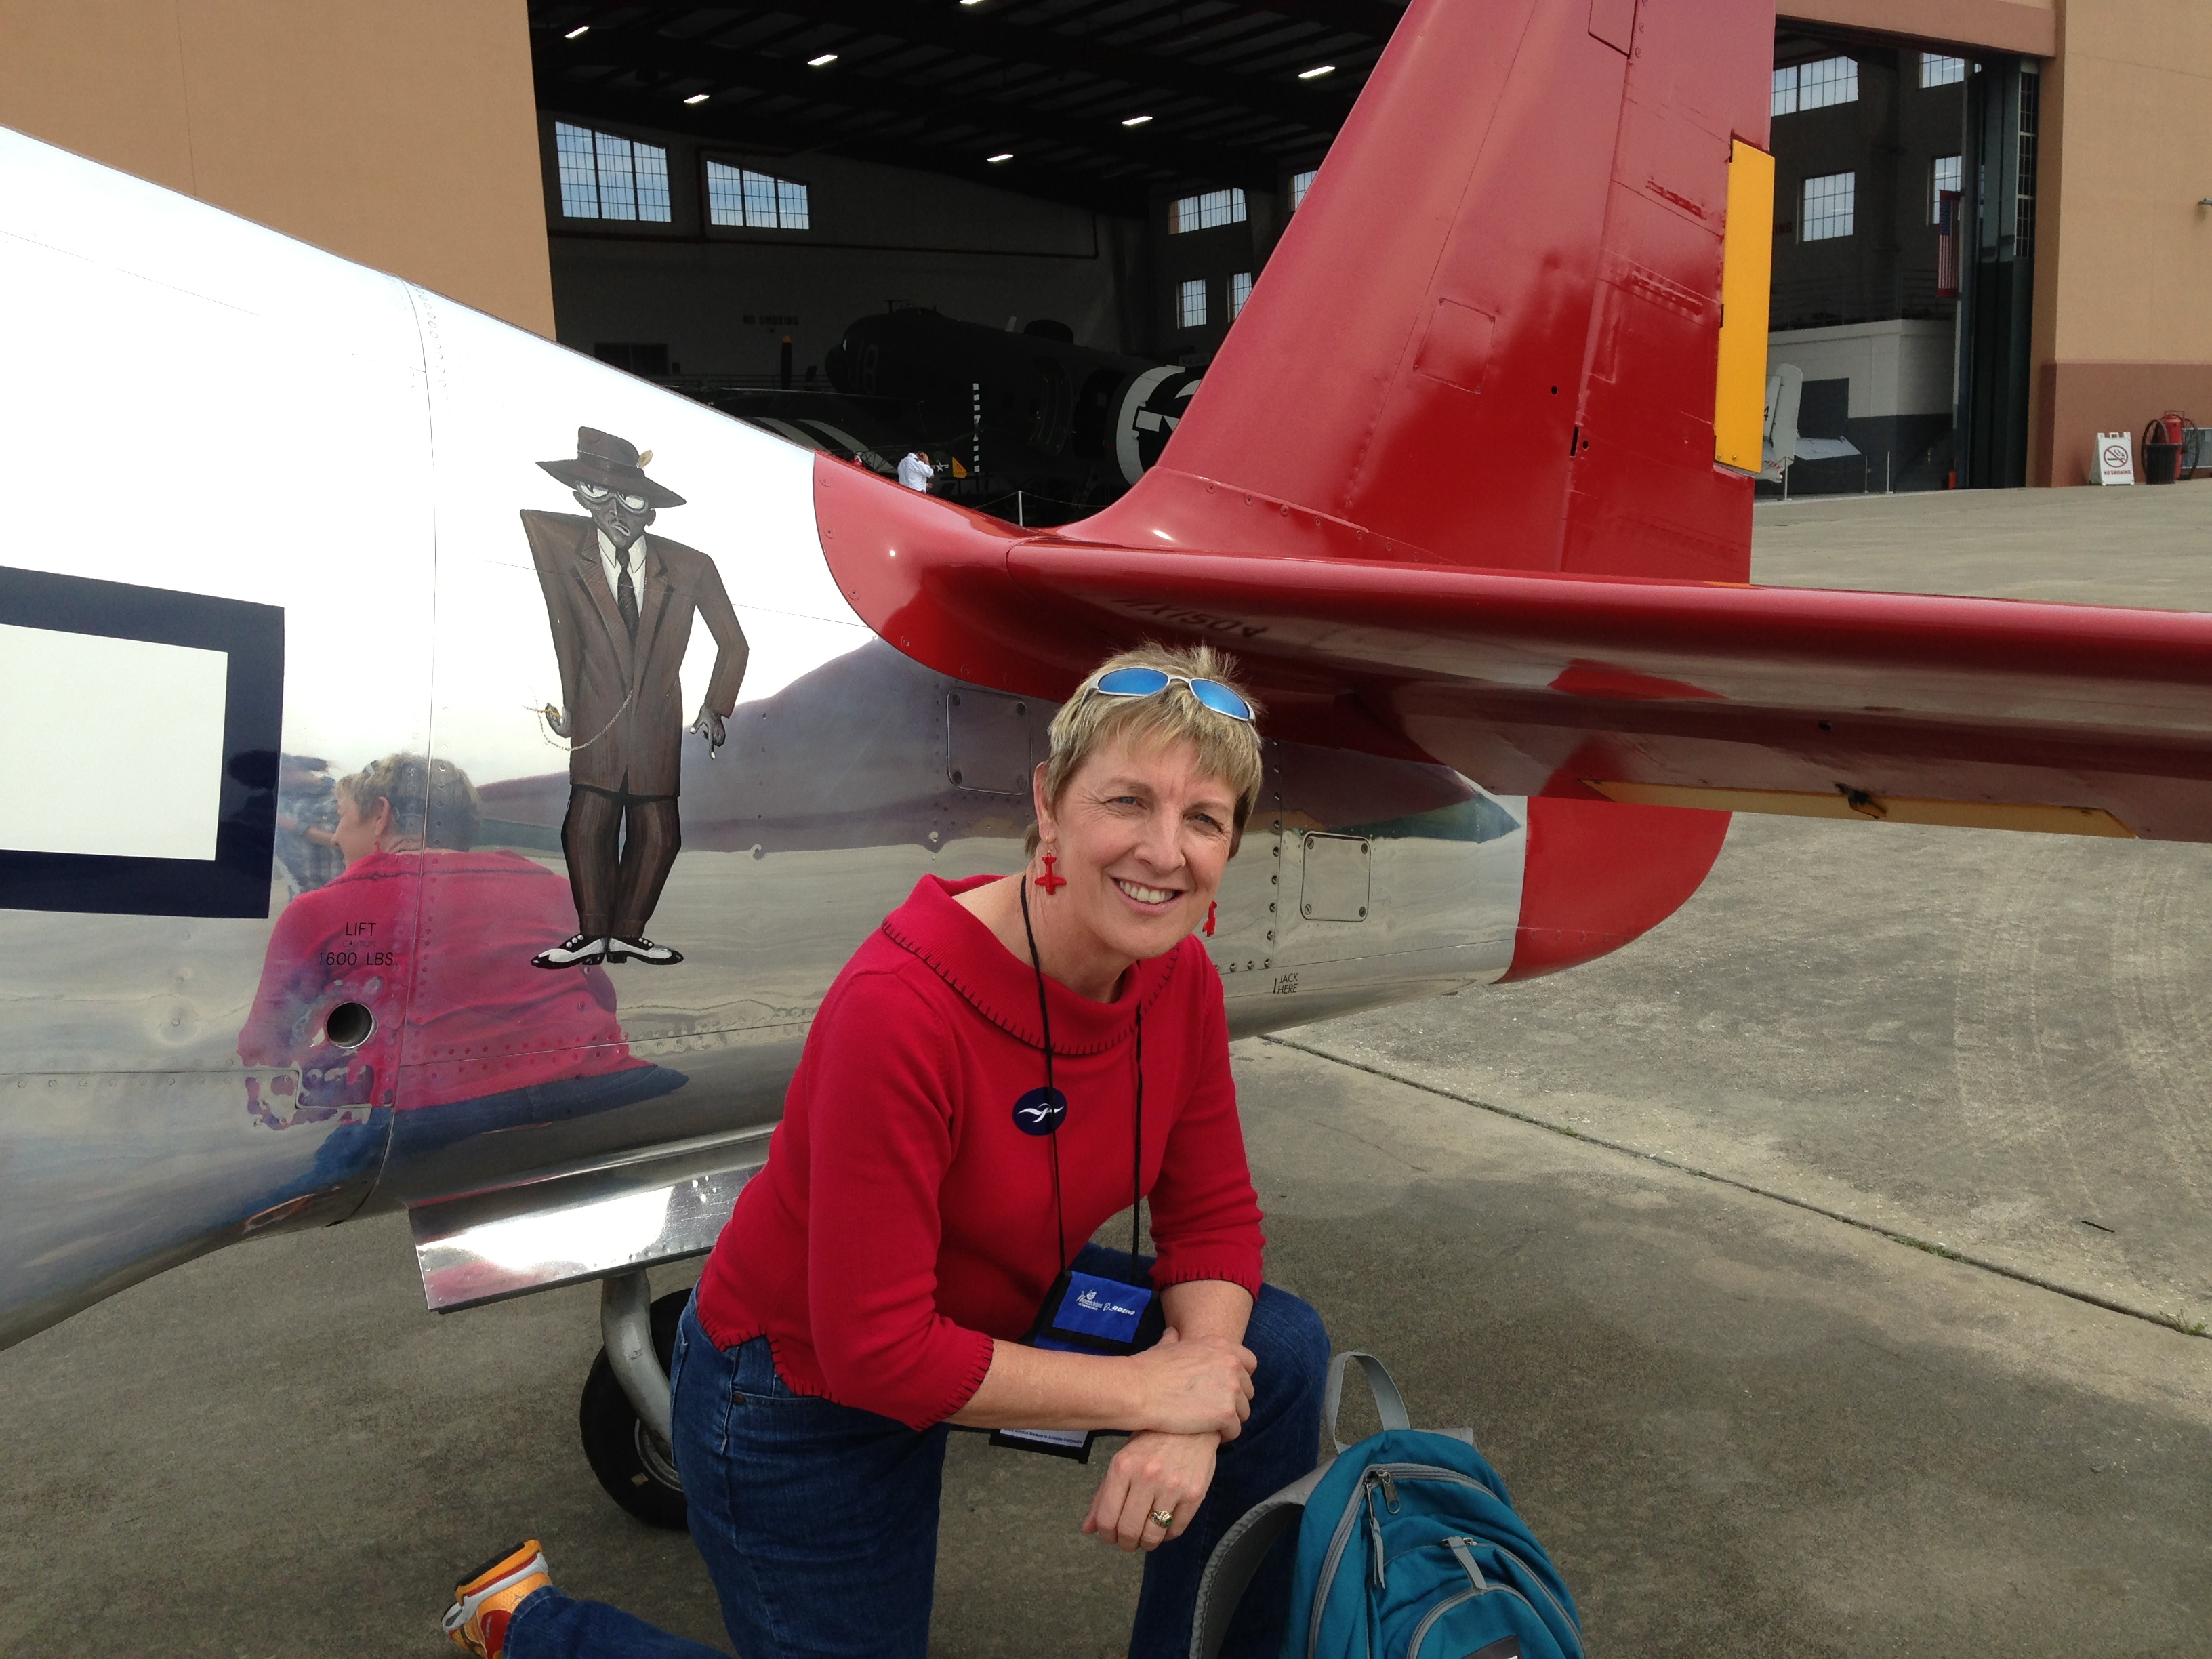 Captain K. Christian Ebert: A Fearless Life, a Giving Legacy